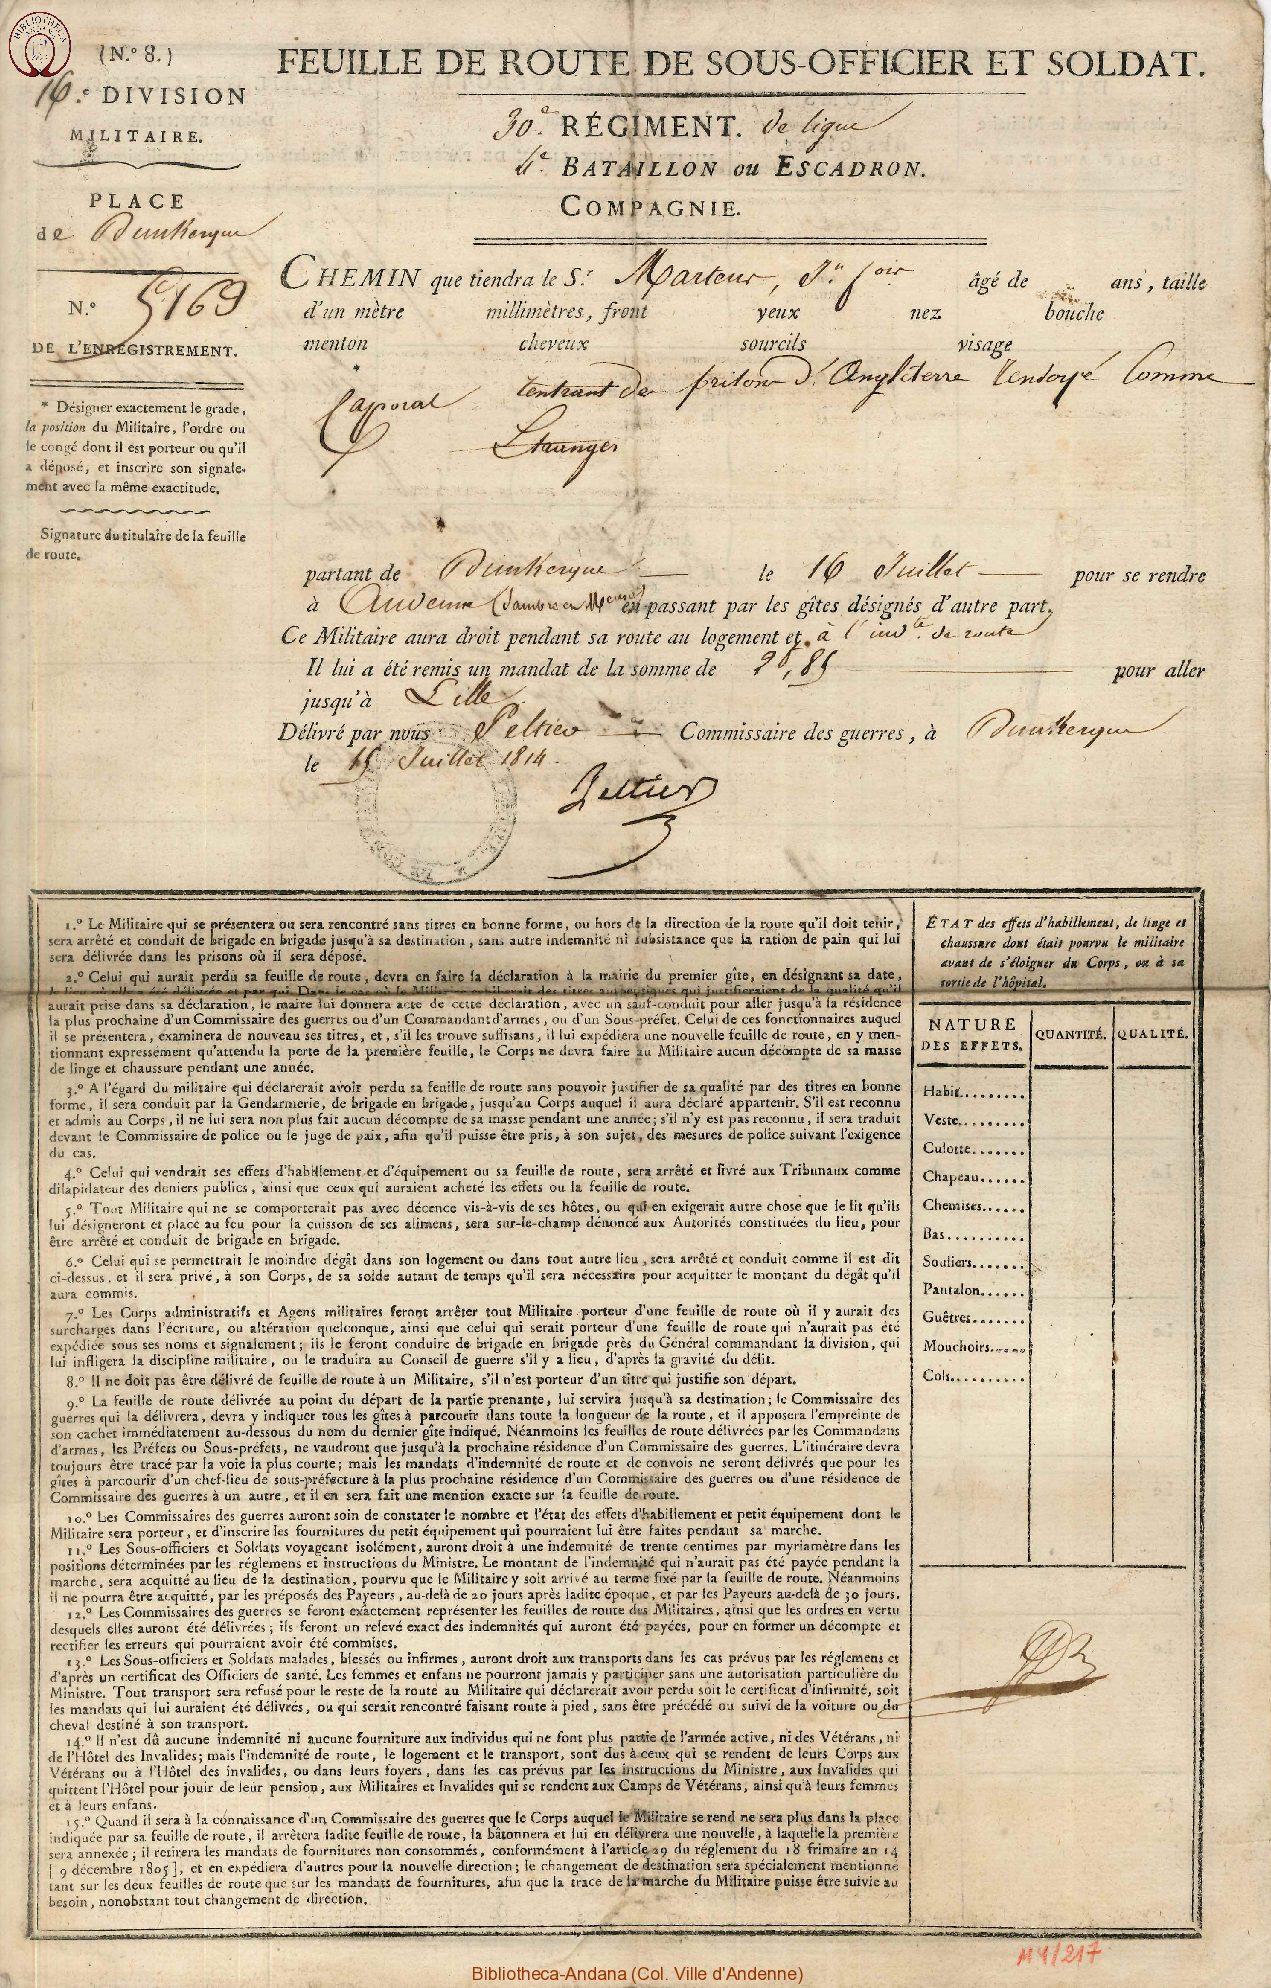 1814-07-15